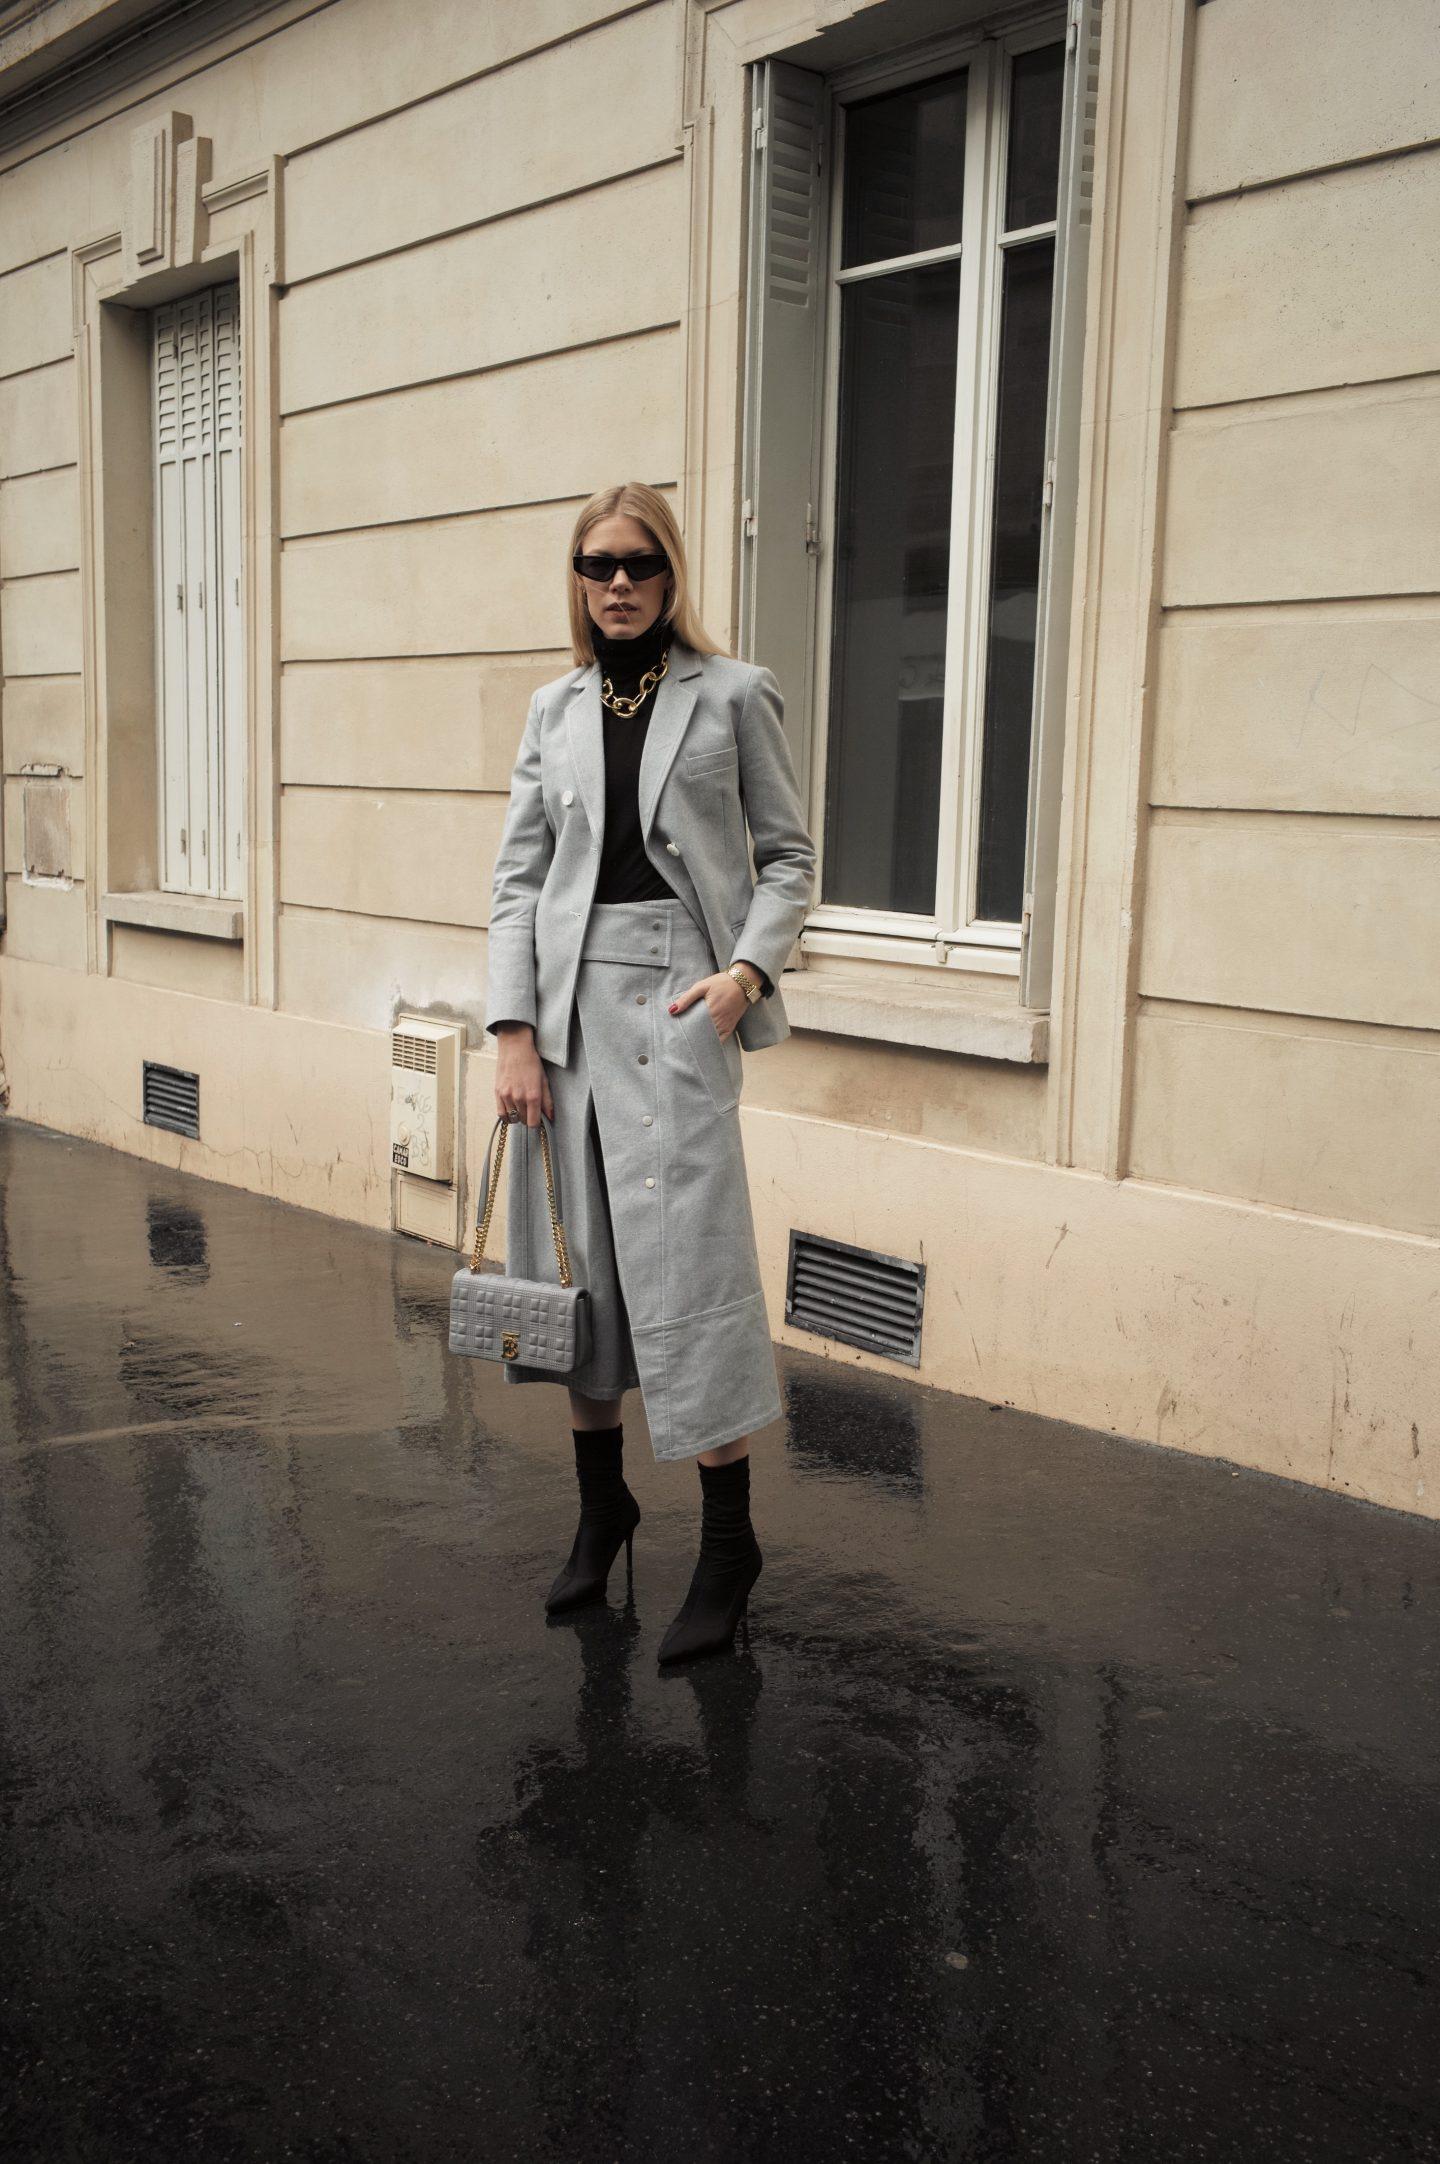 Philip-Lim-skirt-paris-fashion-week-2020-Farfetch